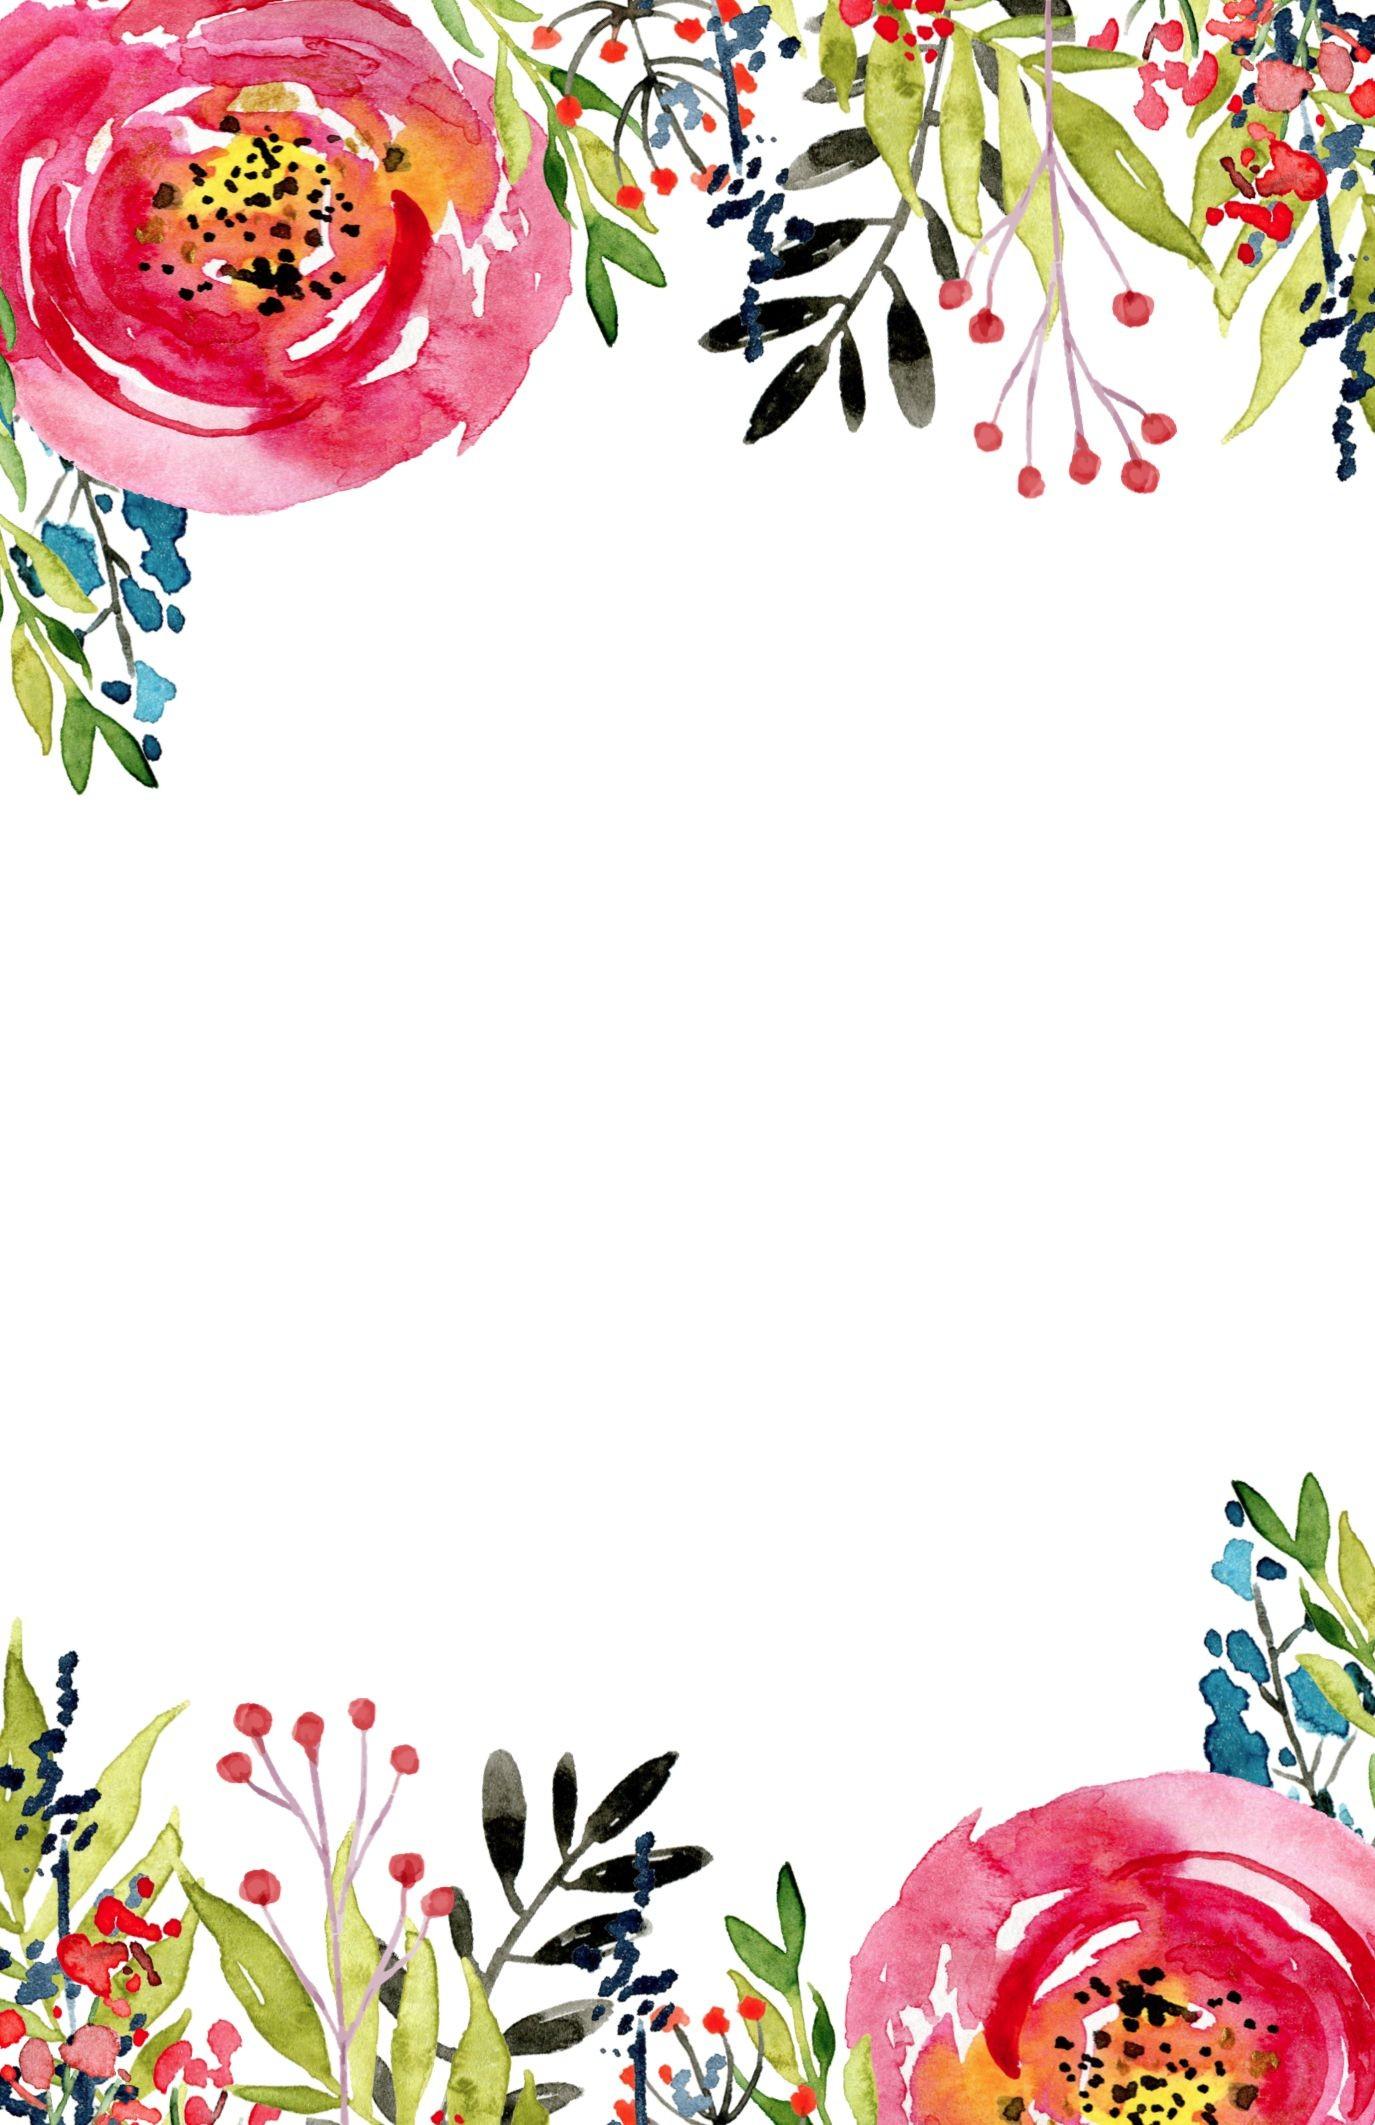 Calendario 2019 Abril Decoracion De Cuadernos Adolescent Actual Pin De Martina Pagliero En 29